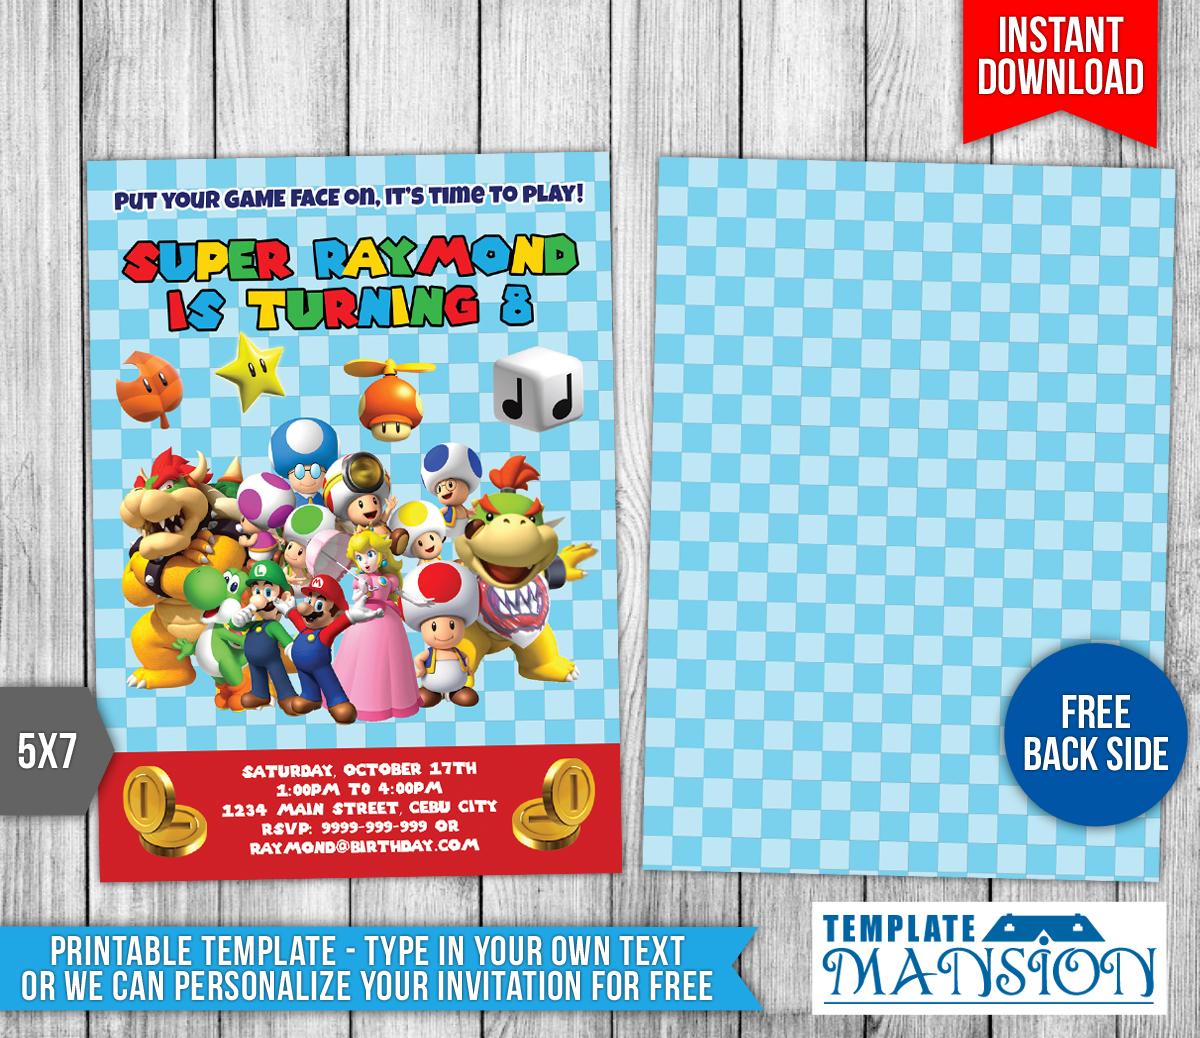 Super Mario Birthday Invitation Template 1 By Templatemansion On Deviantart